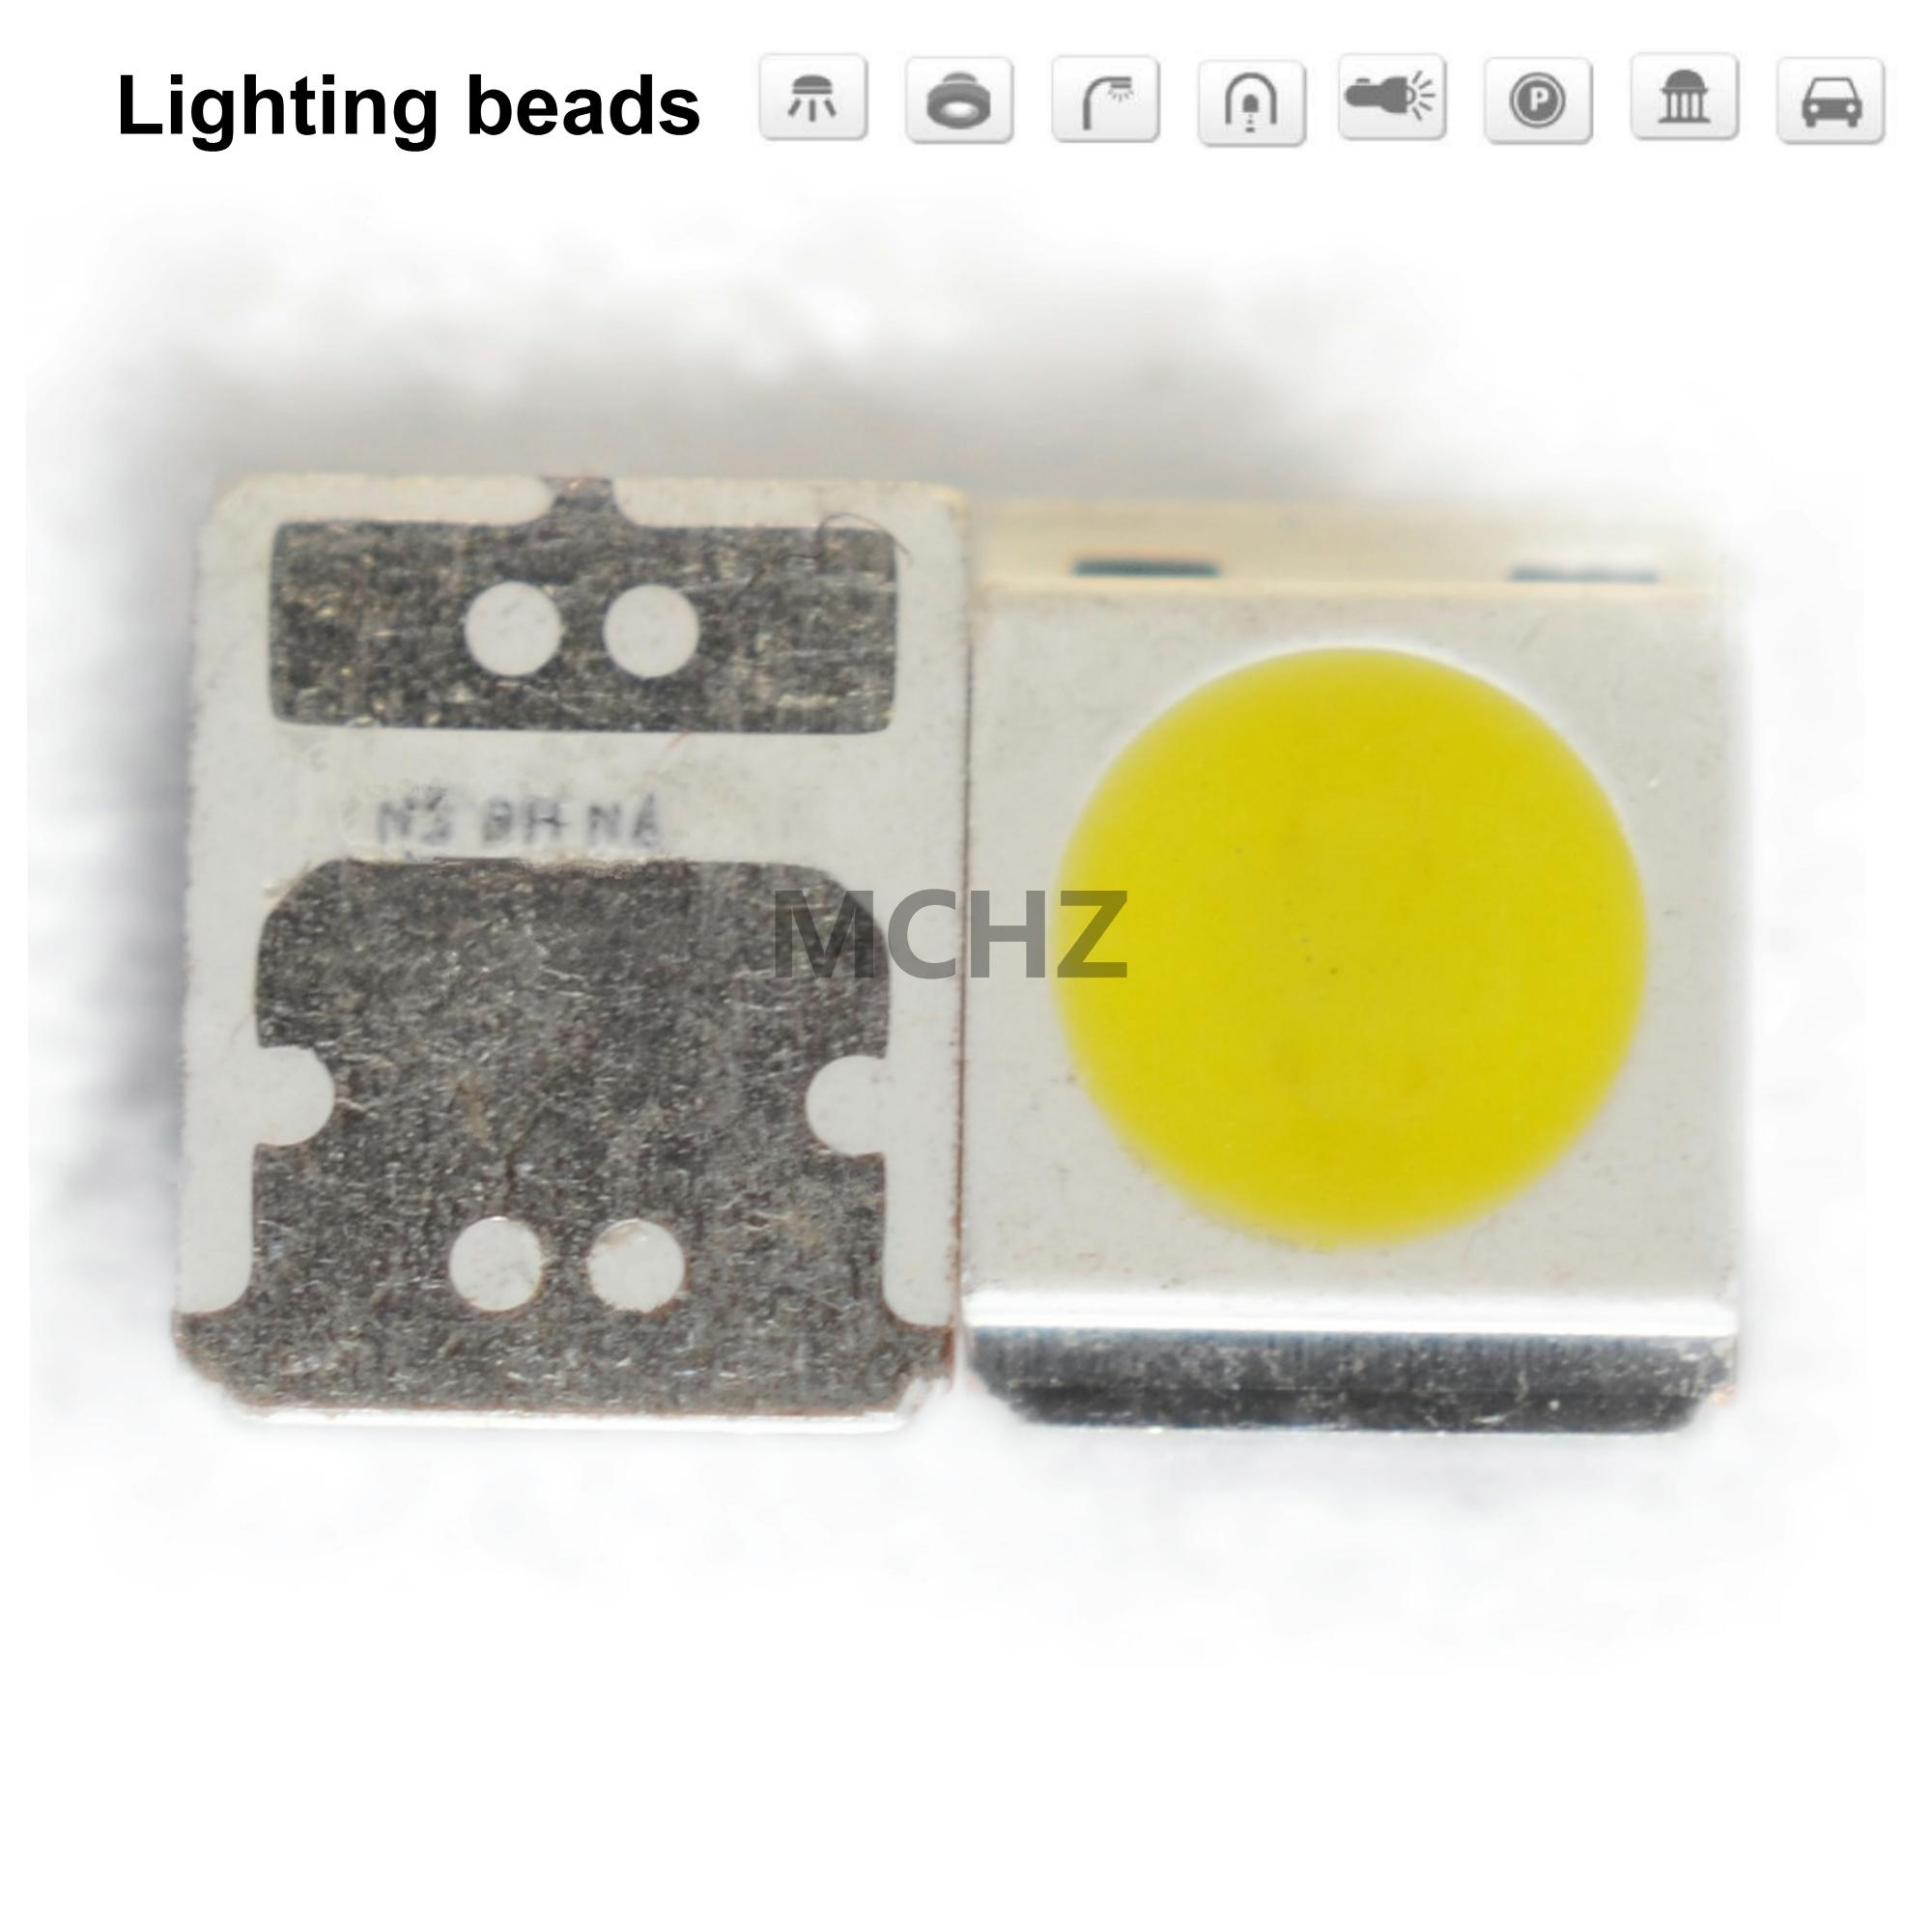 100pcs/lot SMD LED SEOUL 3528 3030 2835 1W 2W 3W White And Warm White Lamp Beads Highlight 3V-3.6V 700MA 5000-5500K